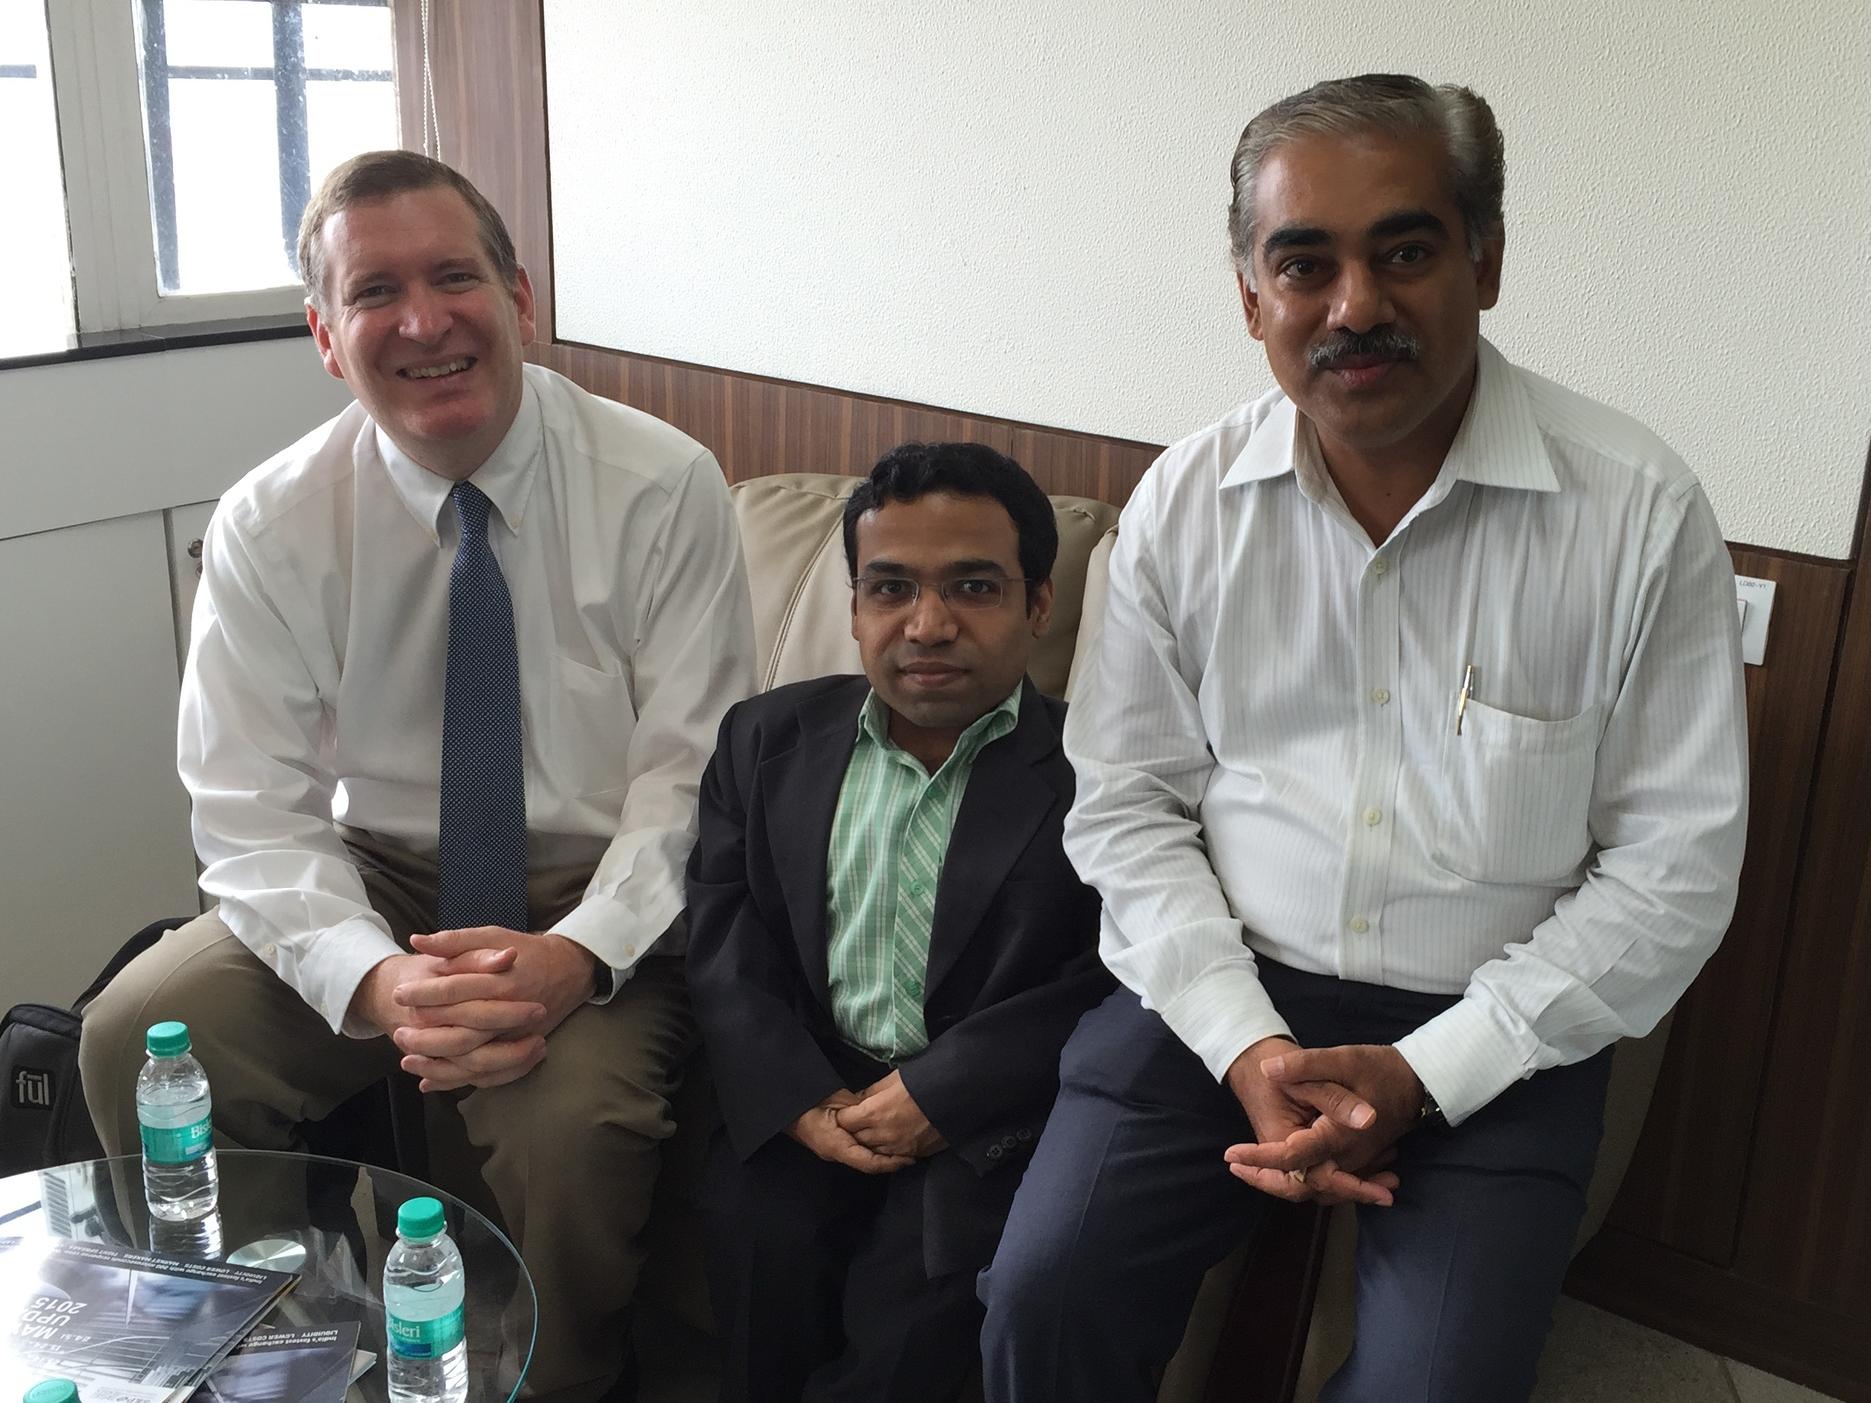 John Lunt with Chetan Pithadle and Piyush Chourasia